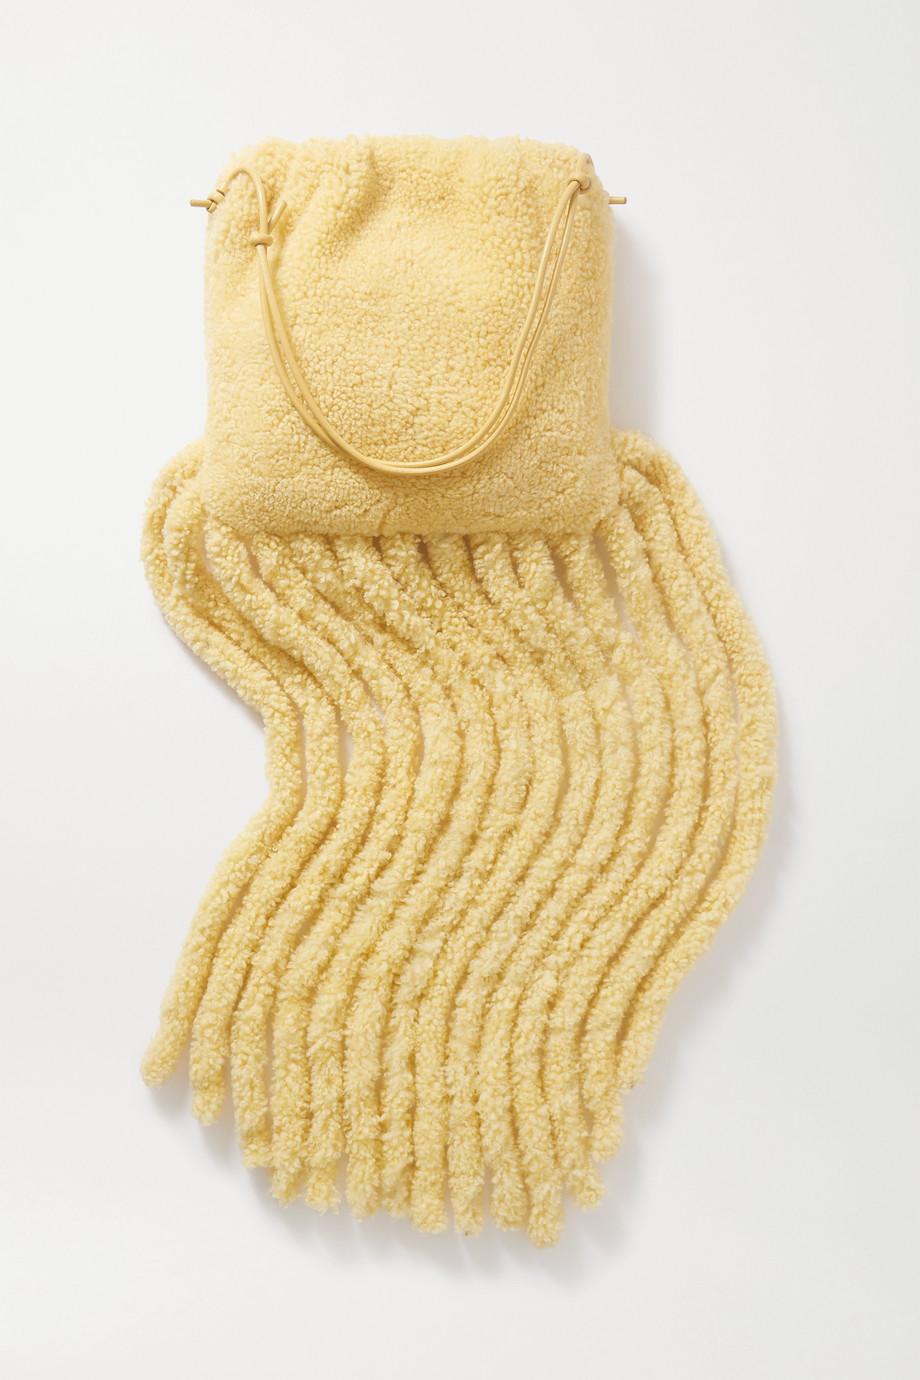 Bottega Veneta 流苏羊毛皮边饰皮革单肩包